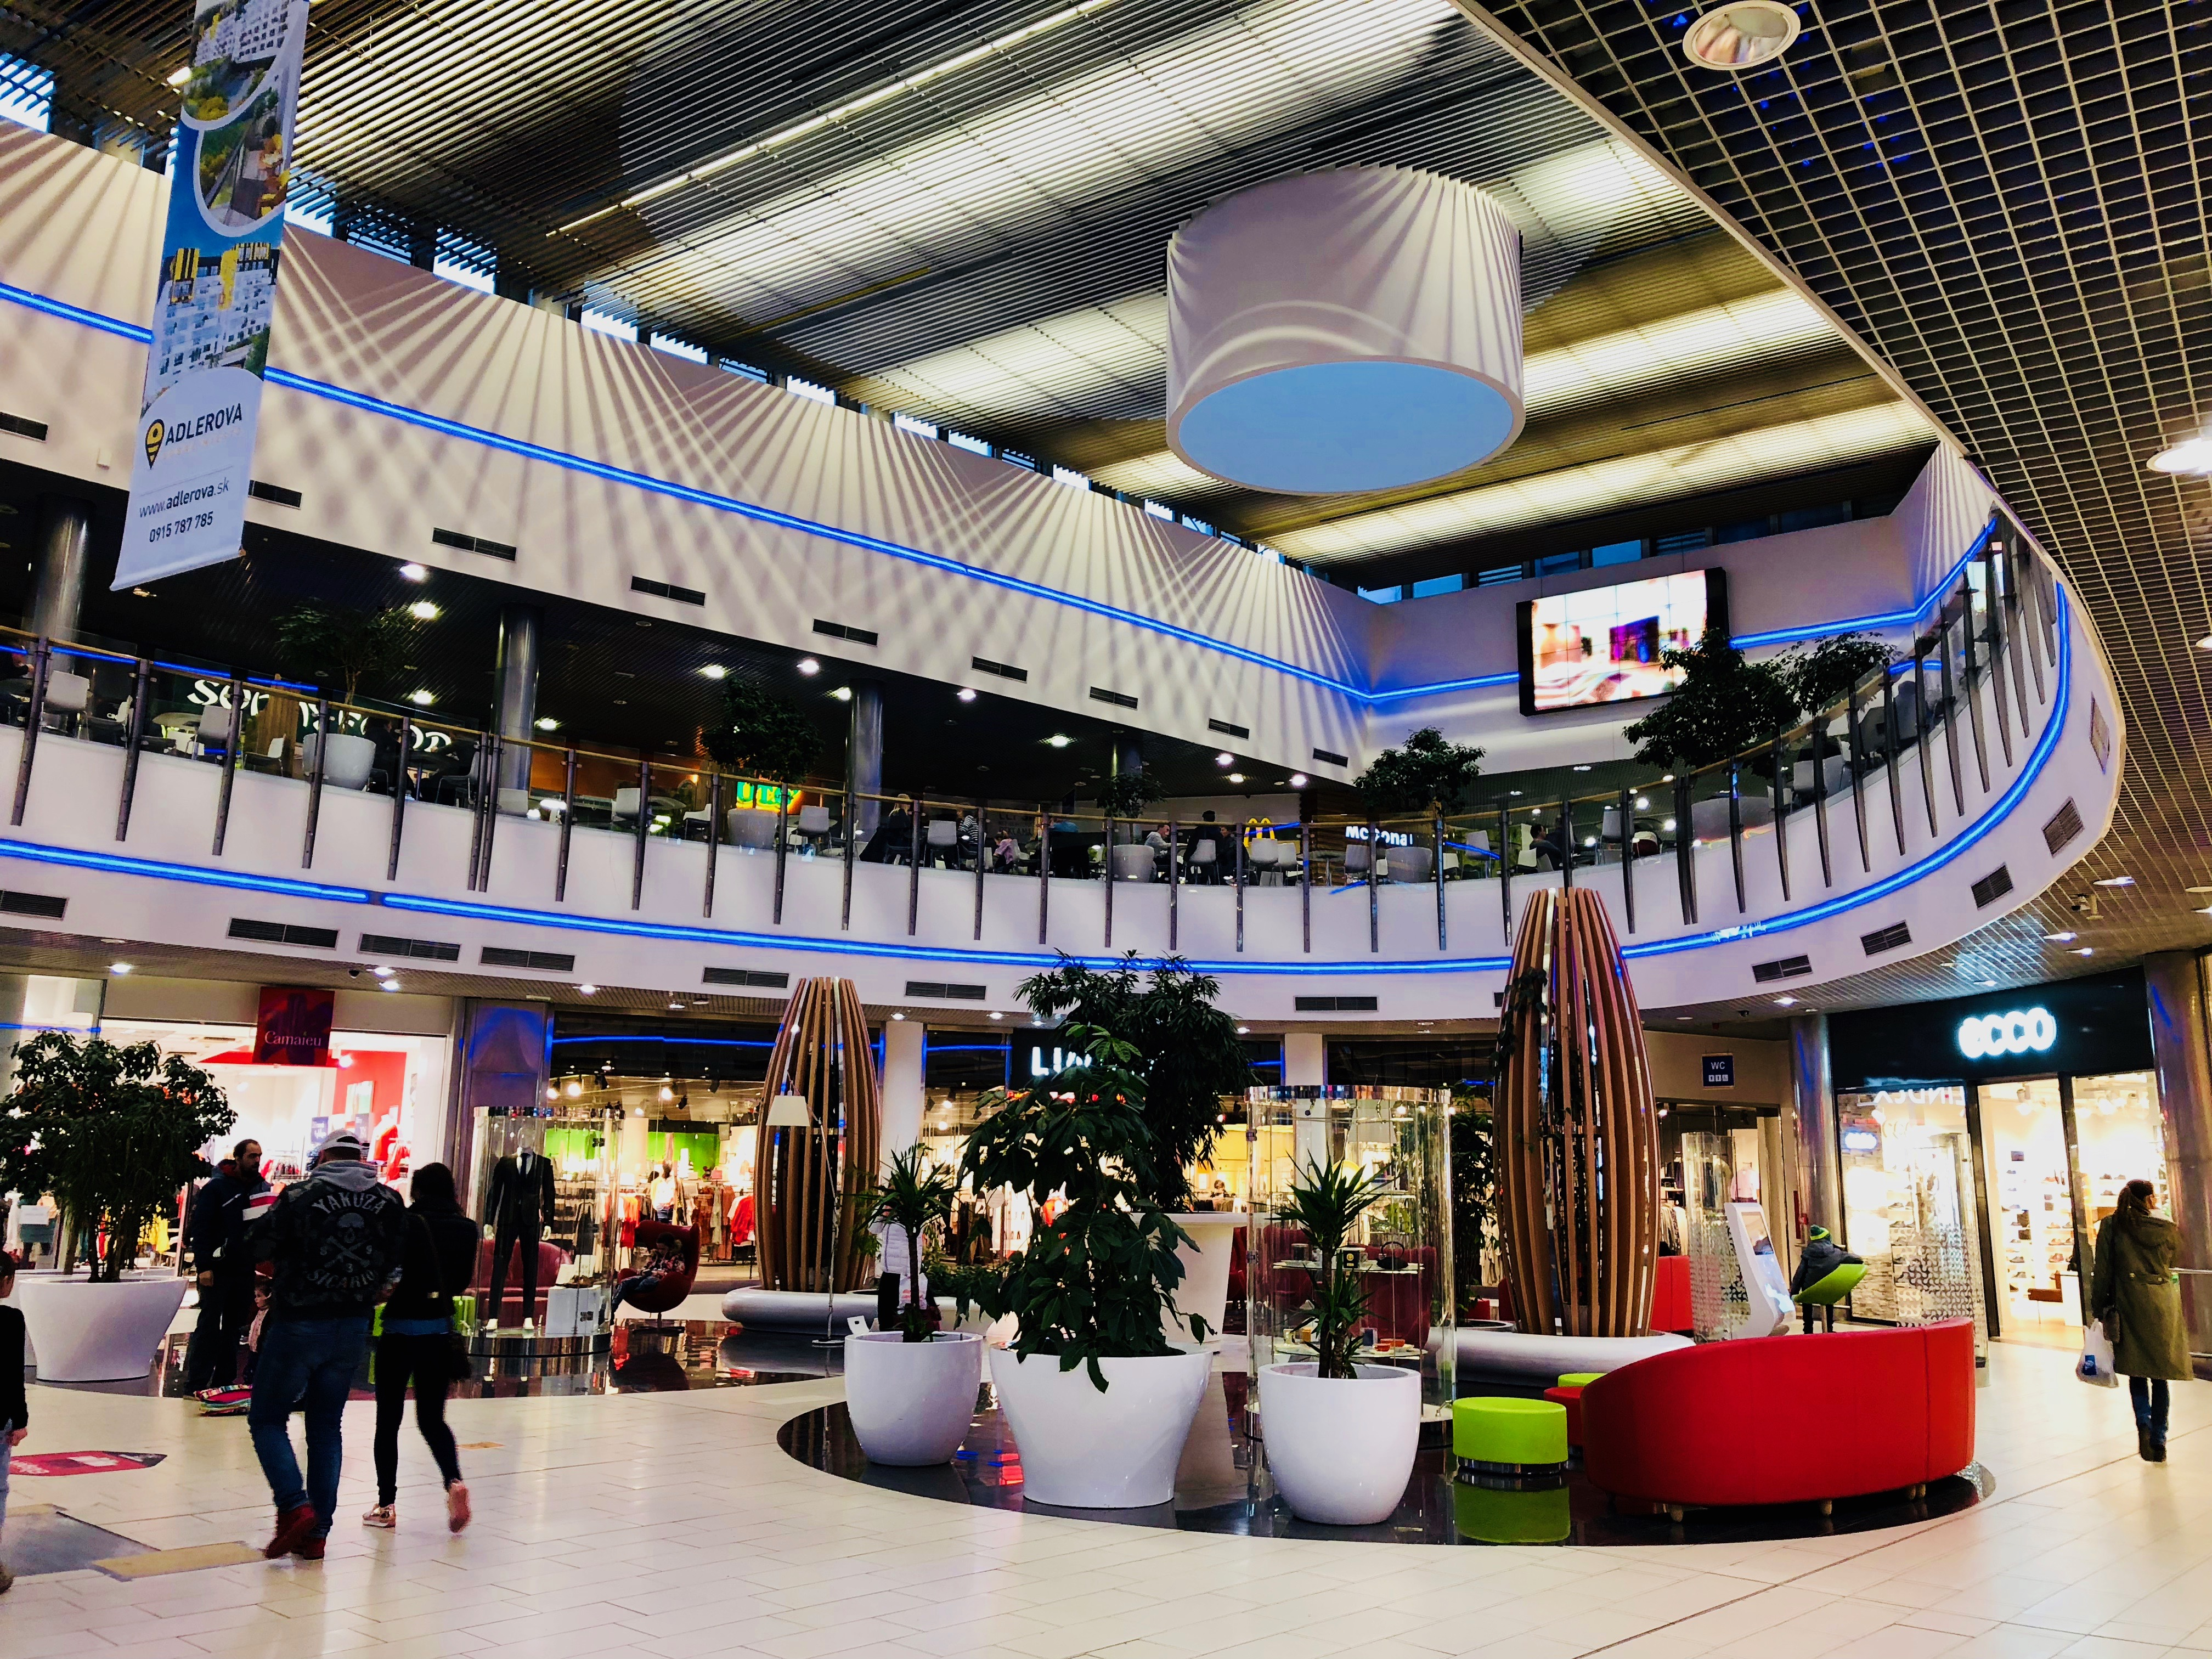 43934a7f08 Súbor Atrium Optima Košice - interiér 1.jpg – Wikipédia